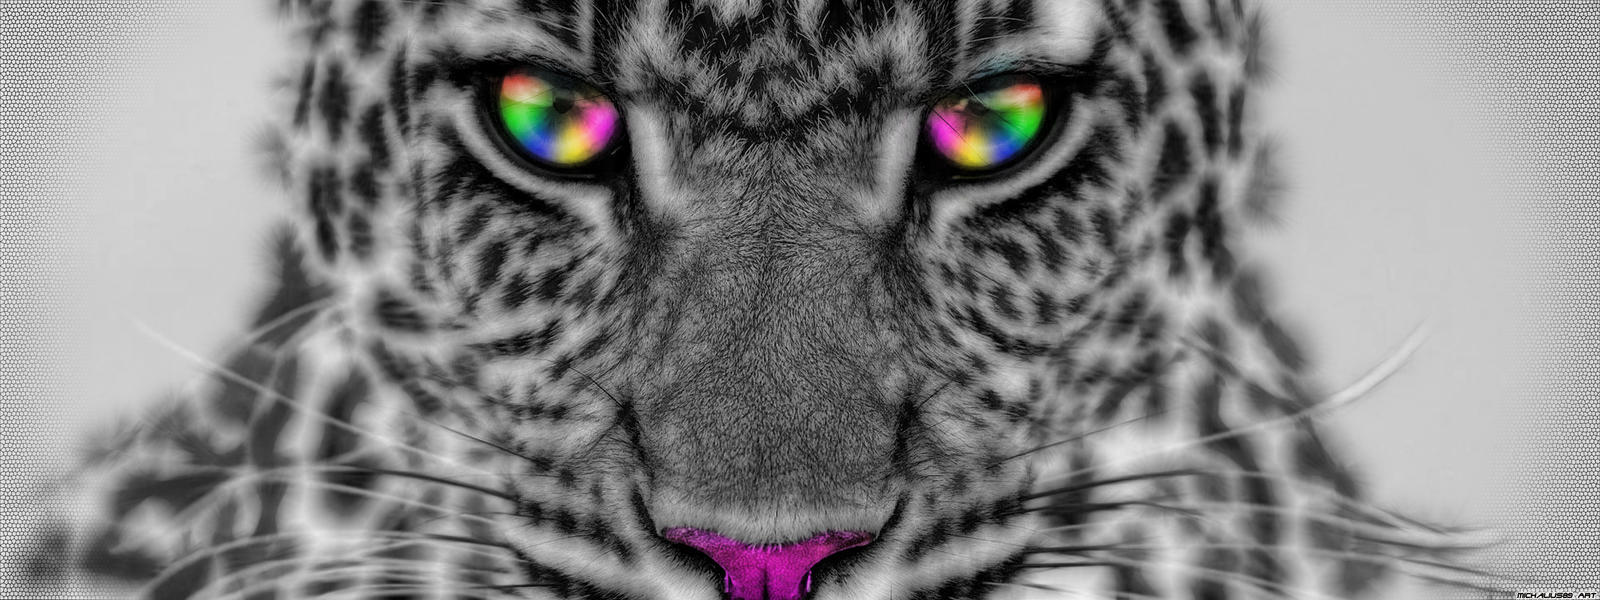 Colorful Cheetah by Michalius89 Colorful Cheetah by Michalius89